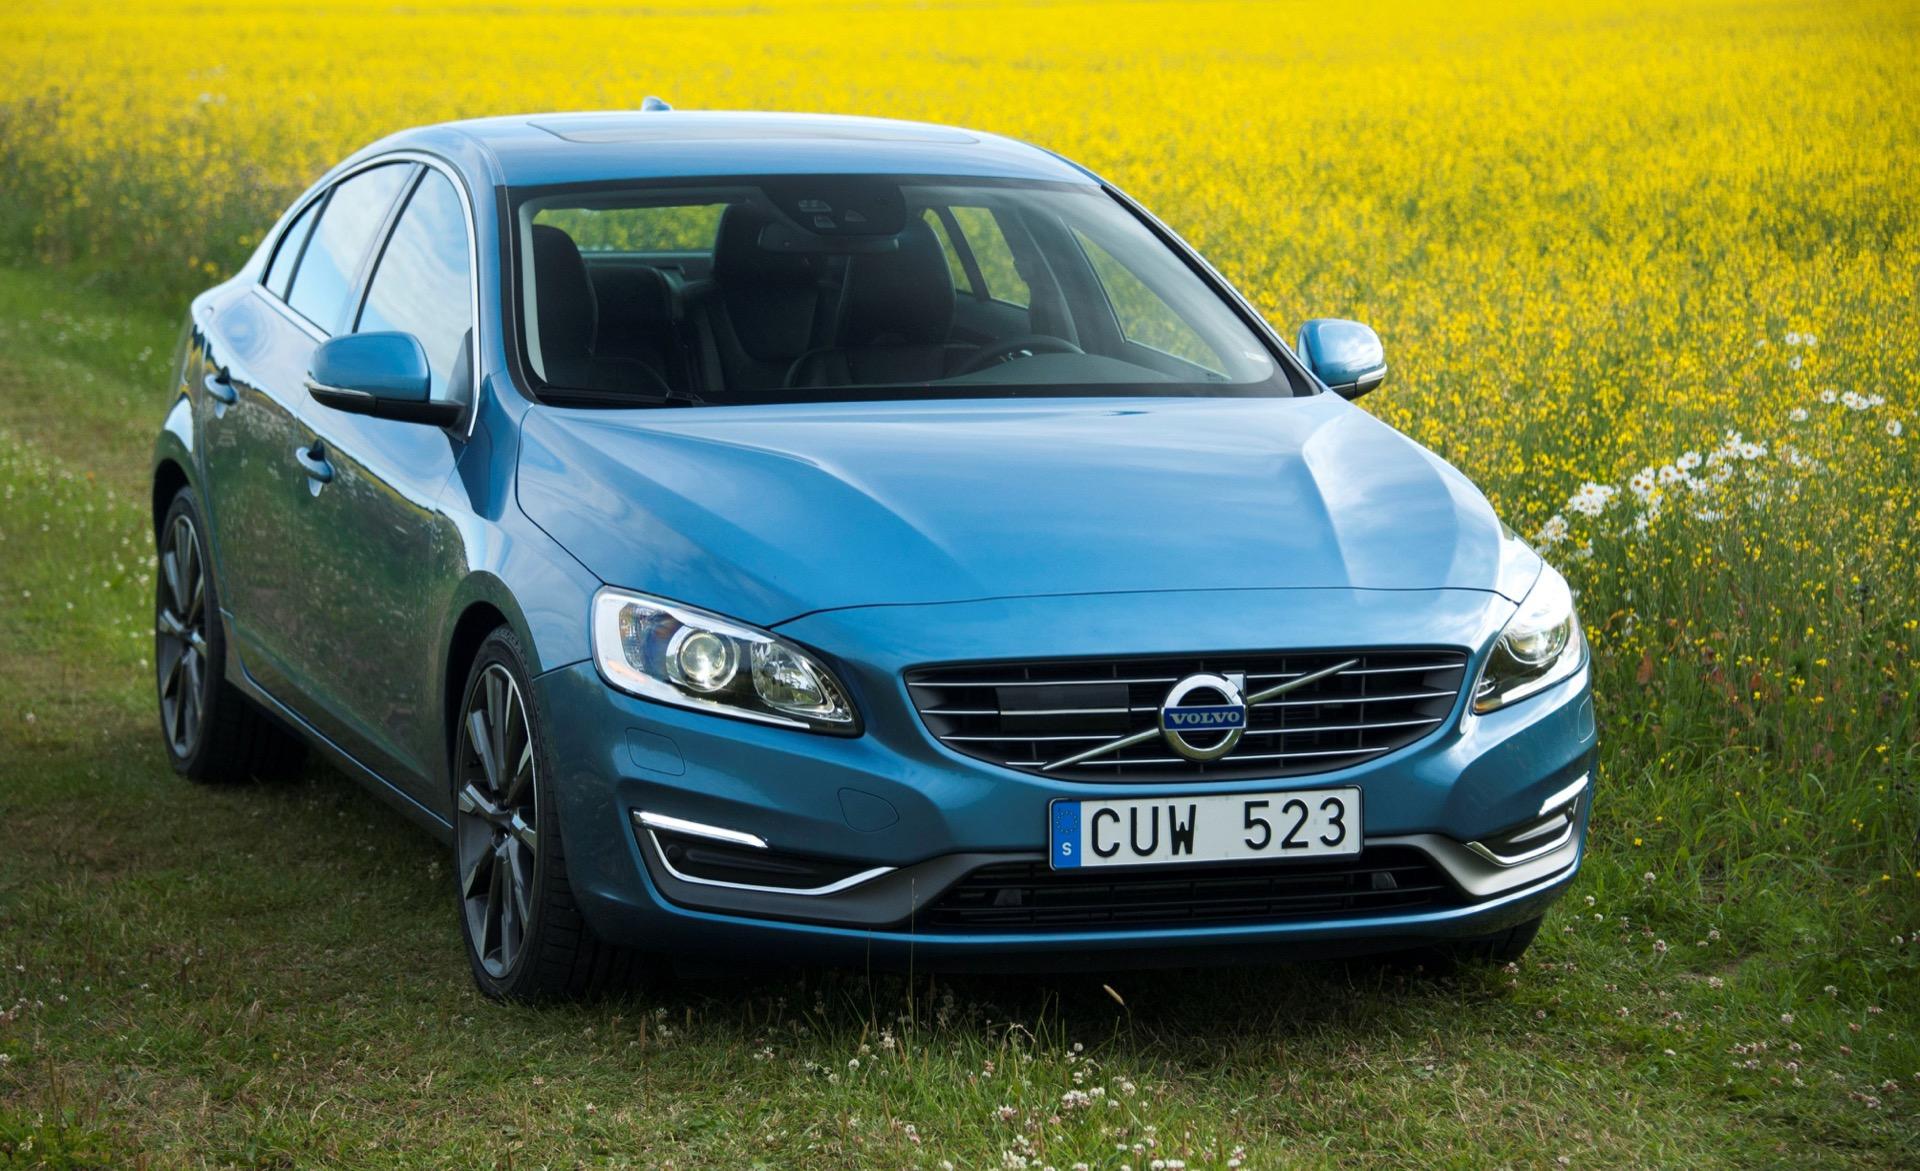 Volvo S60 -  2013, 2014, 2014 S60, Exterior, Images, S60, Volvo